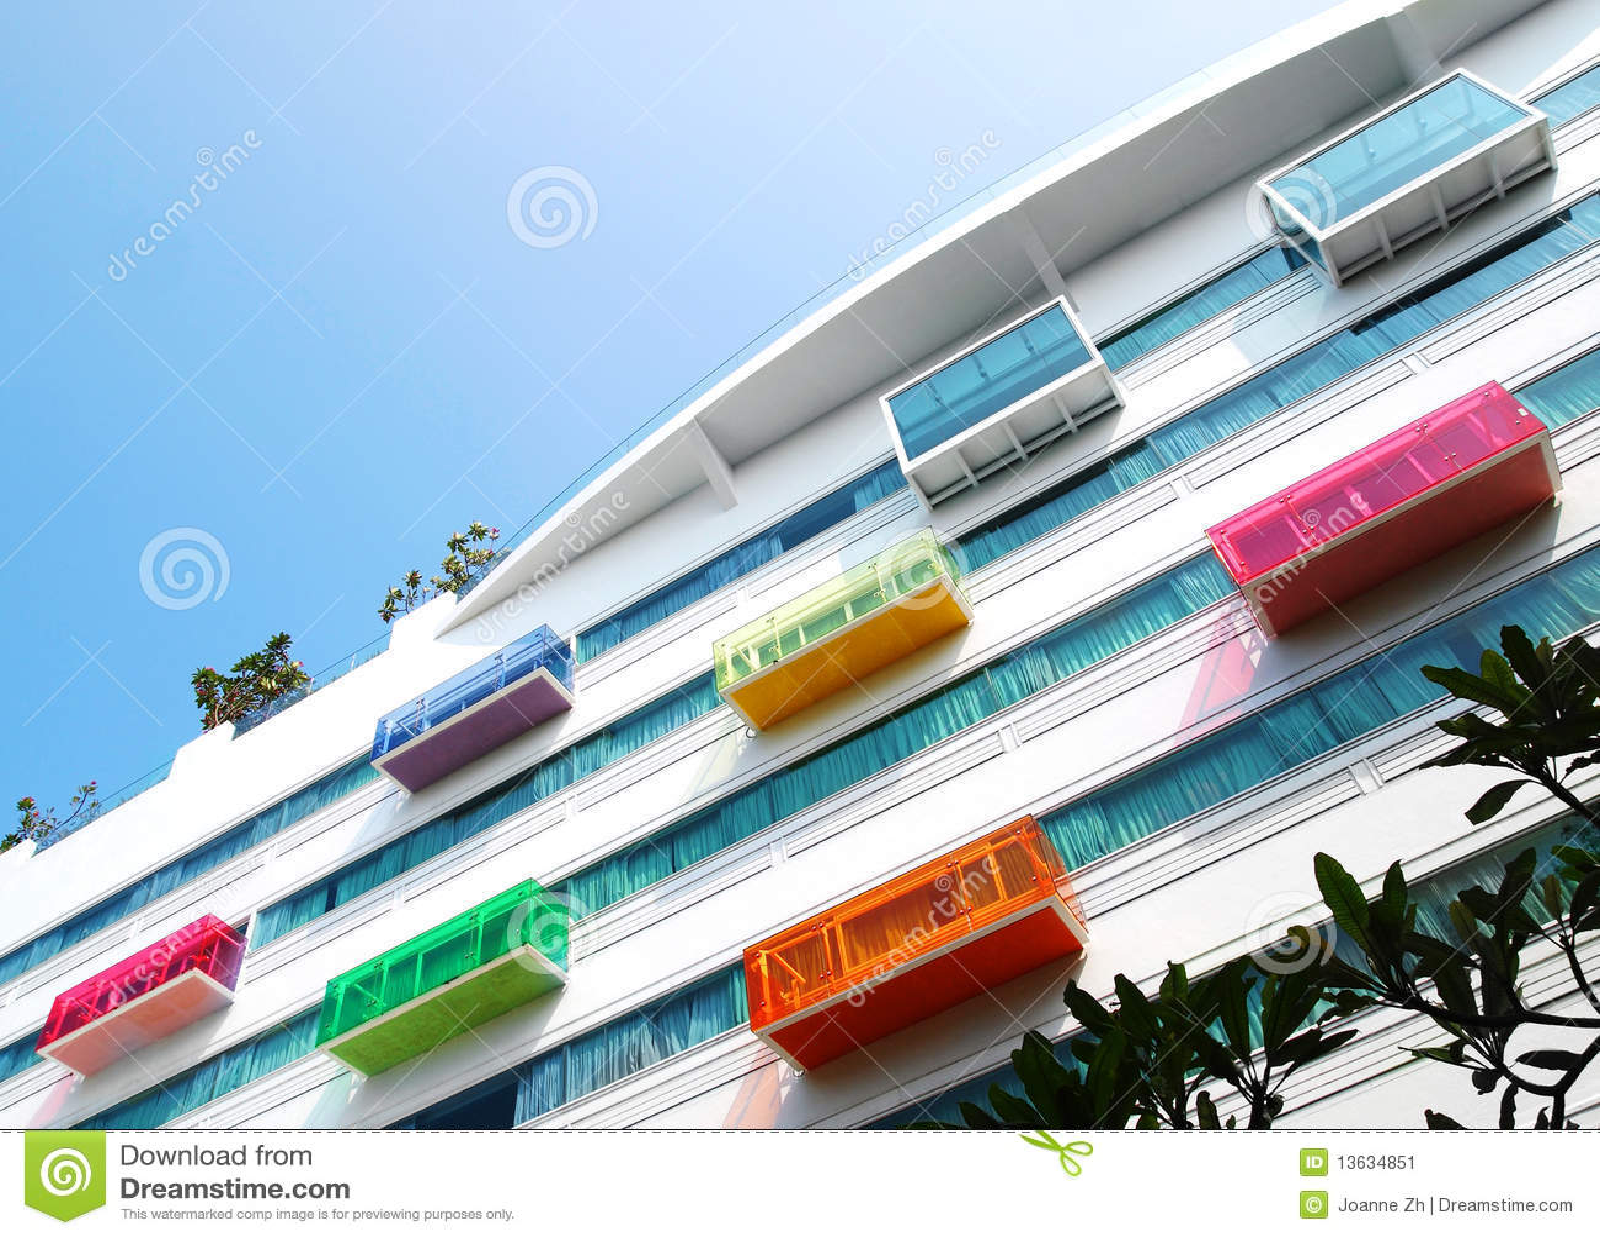 rchitectural Details, Modern Hotel Stock Image - Image: 13634851 - ^